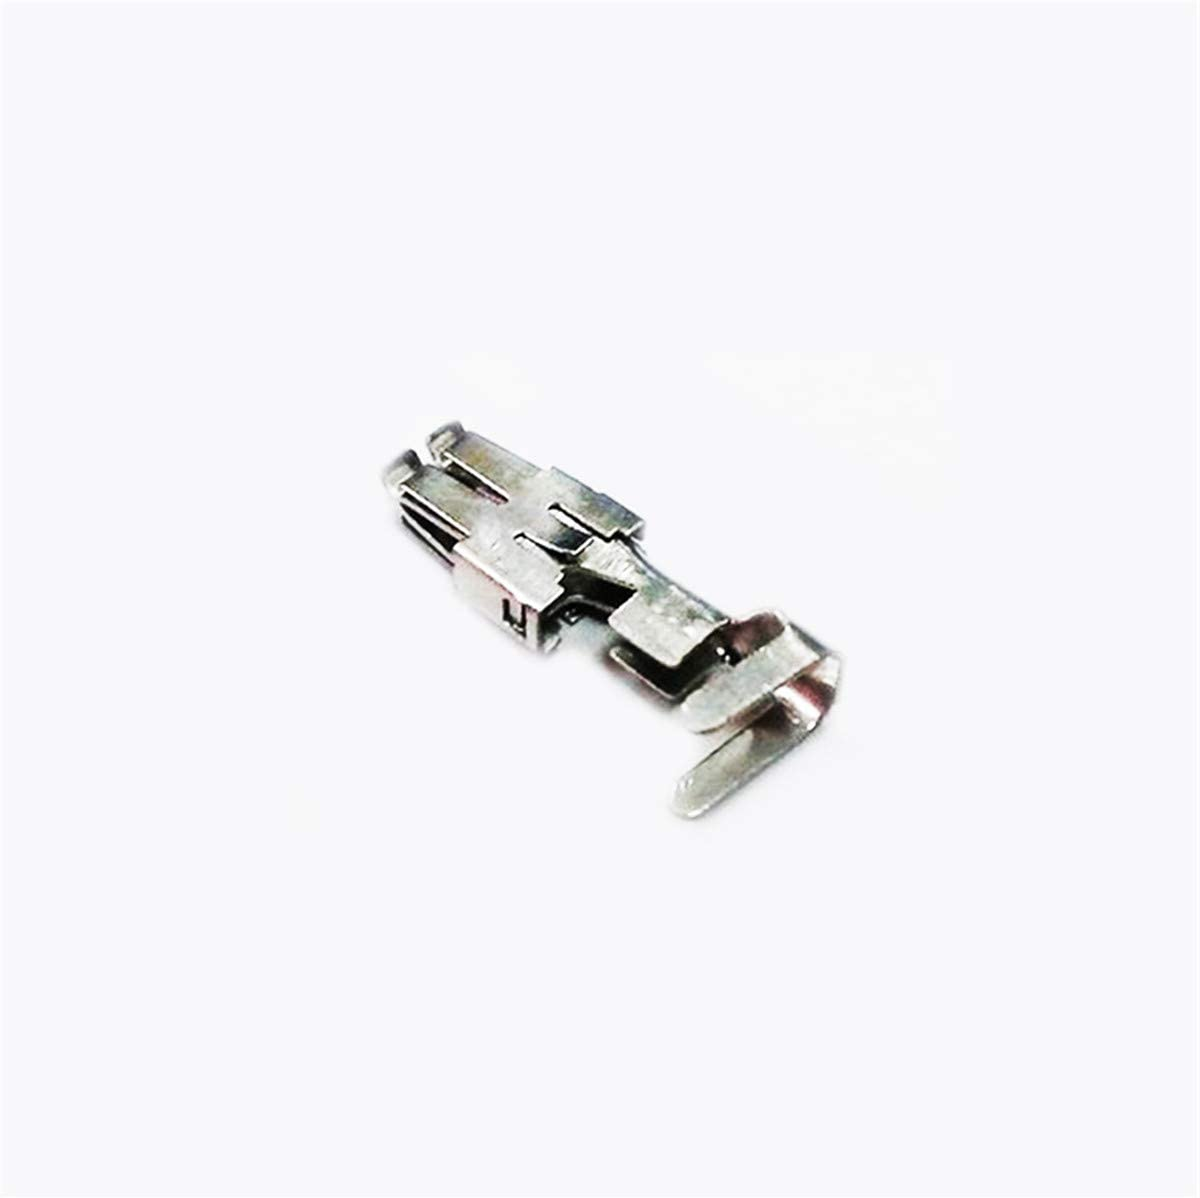 N 906 966 03 Fuse Box Terminal 10 Pcs Copper 4.8mm Female//N 907 327 03